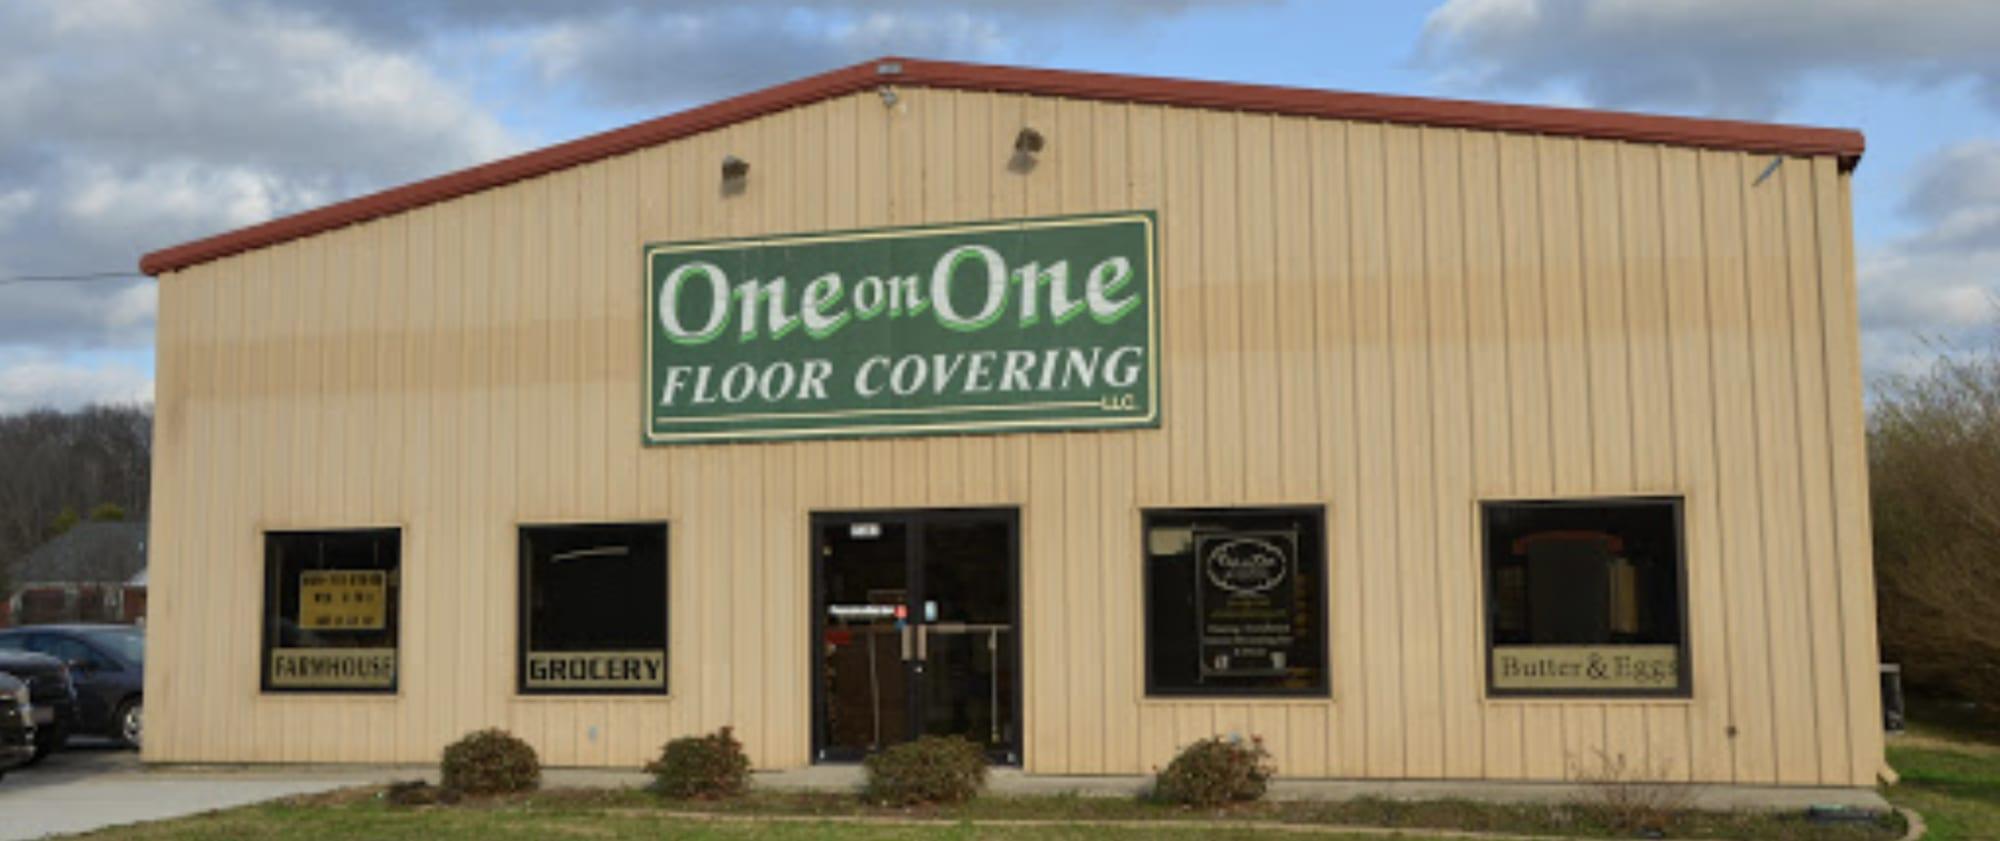 One On One Floor Covering Llc - 14595 US-231 Hazel Green, AL 35750